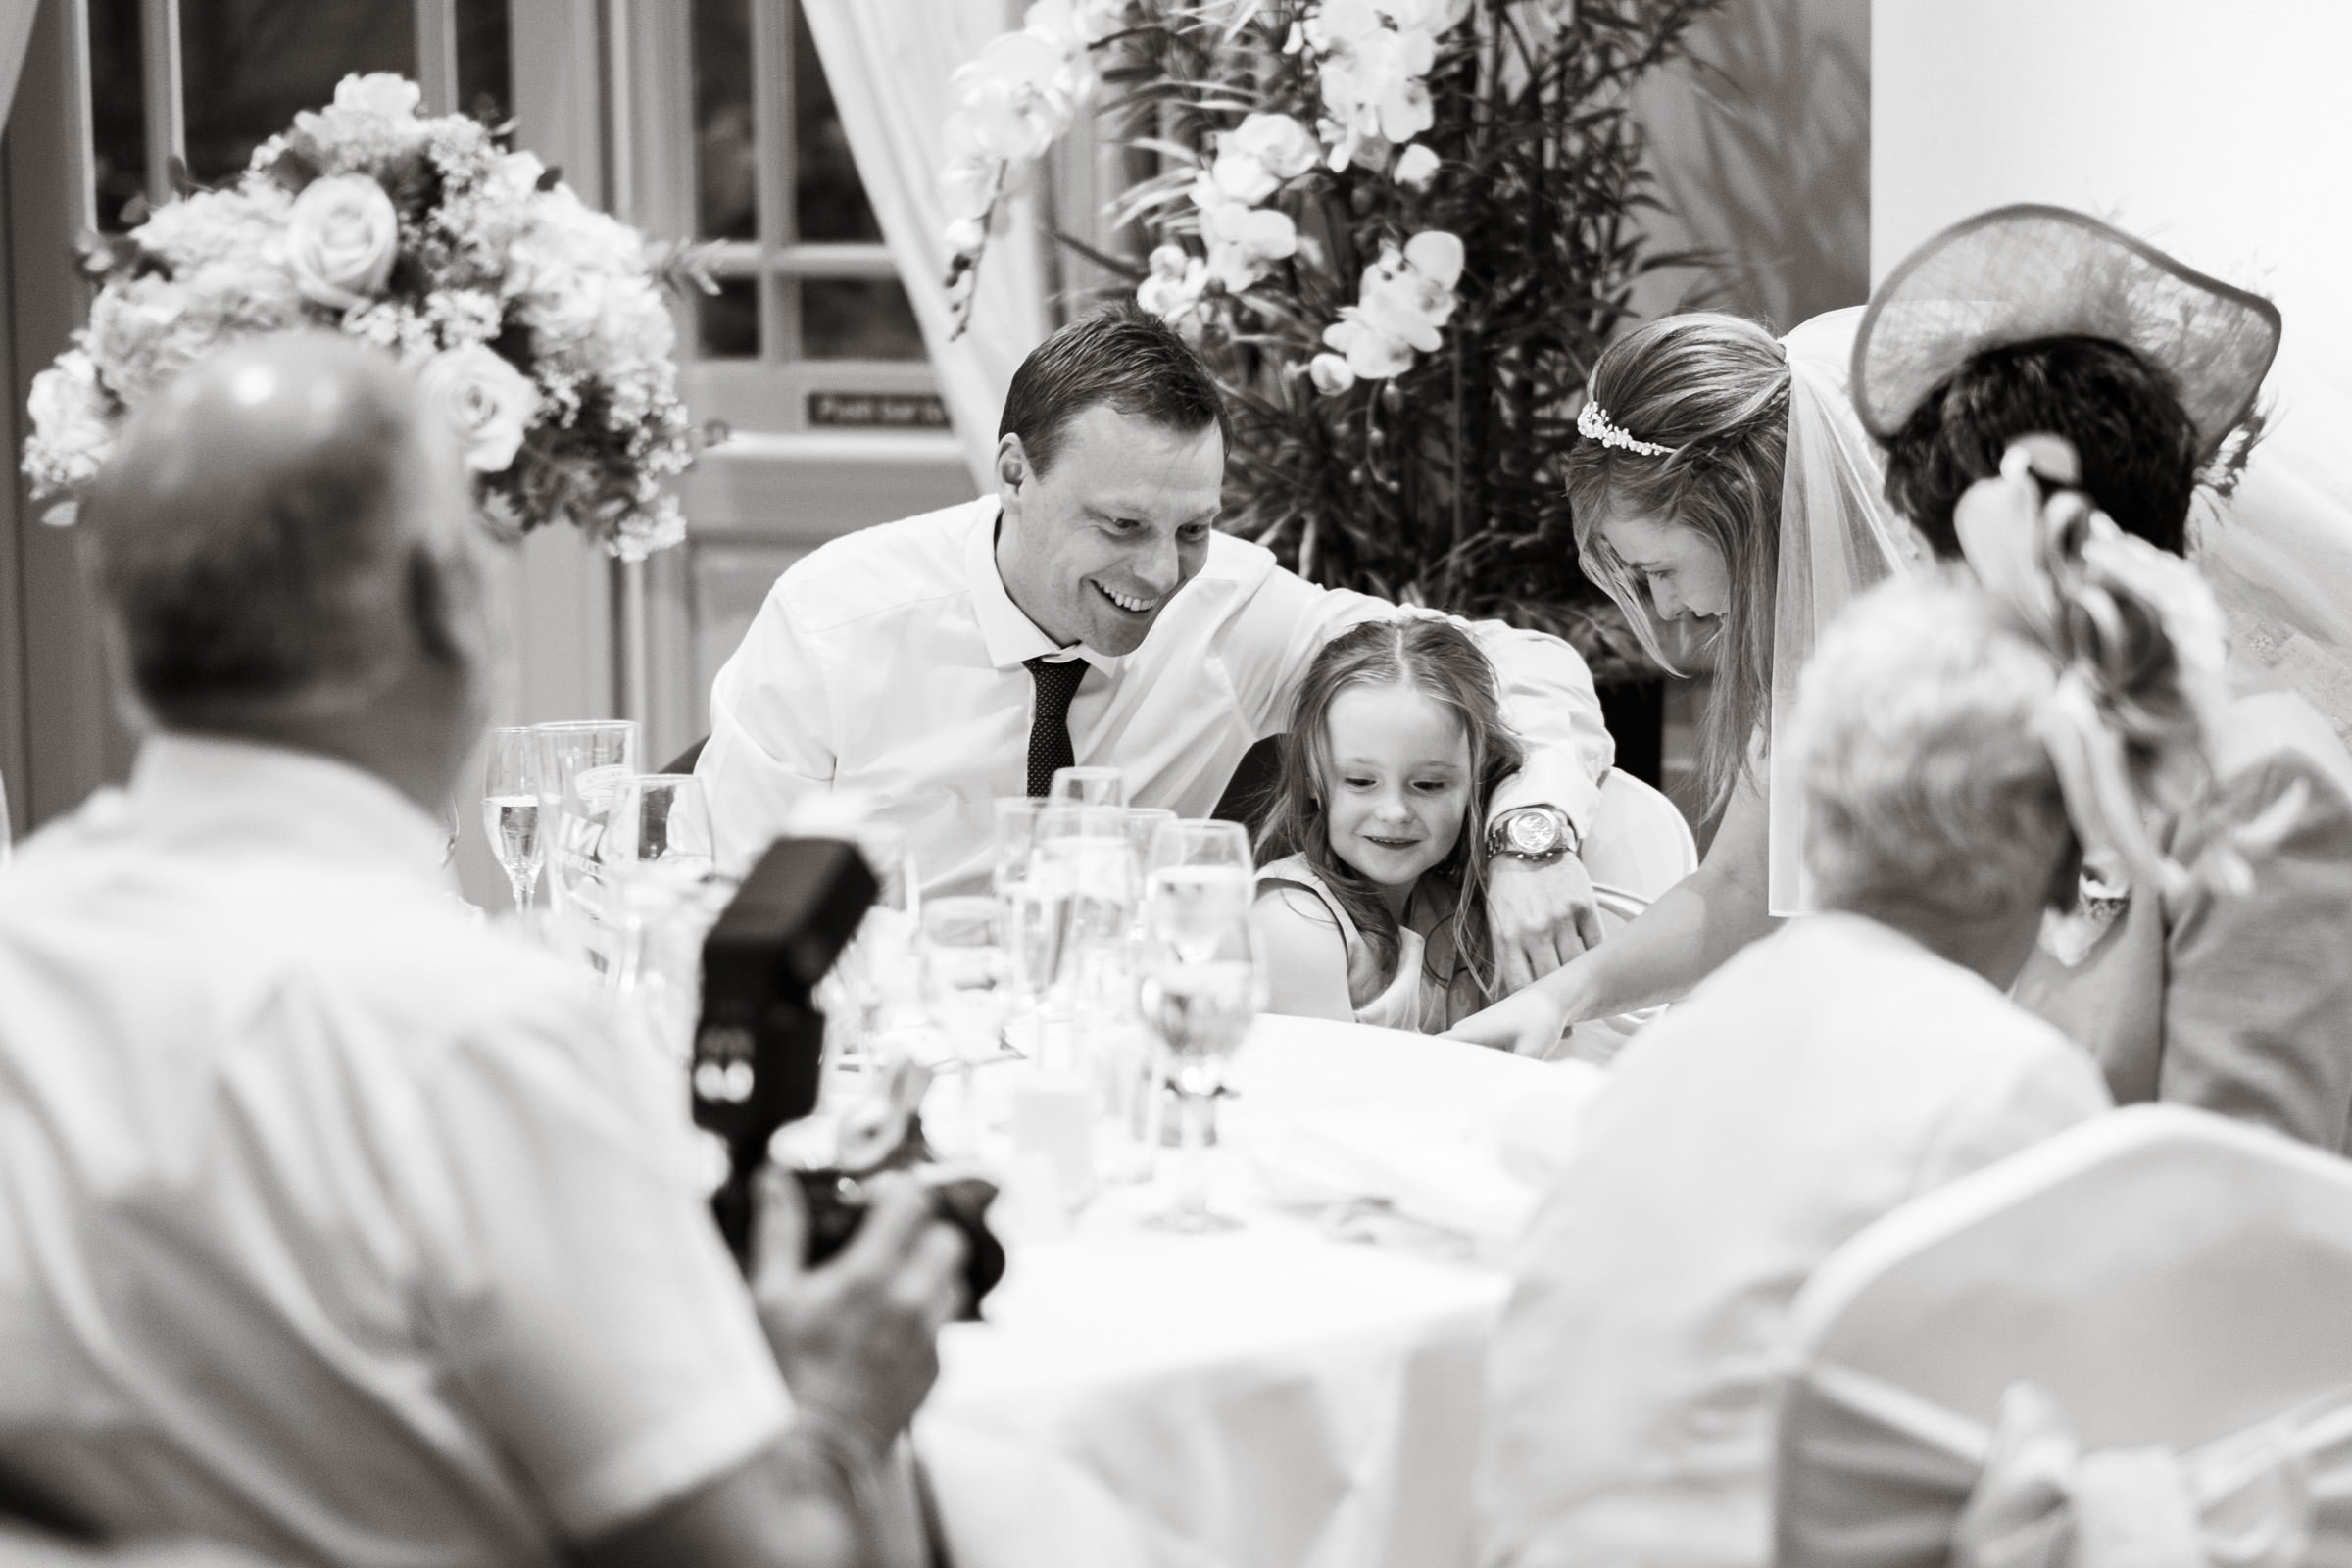 Donna & Nick's Wedding at Wotton House in Dorking 022.jpg